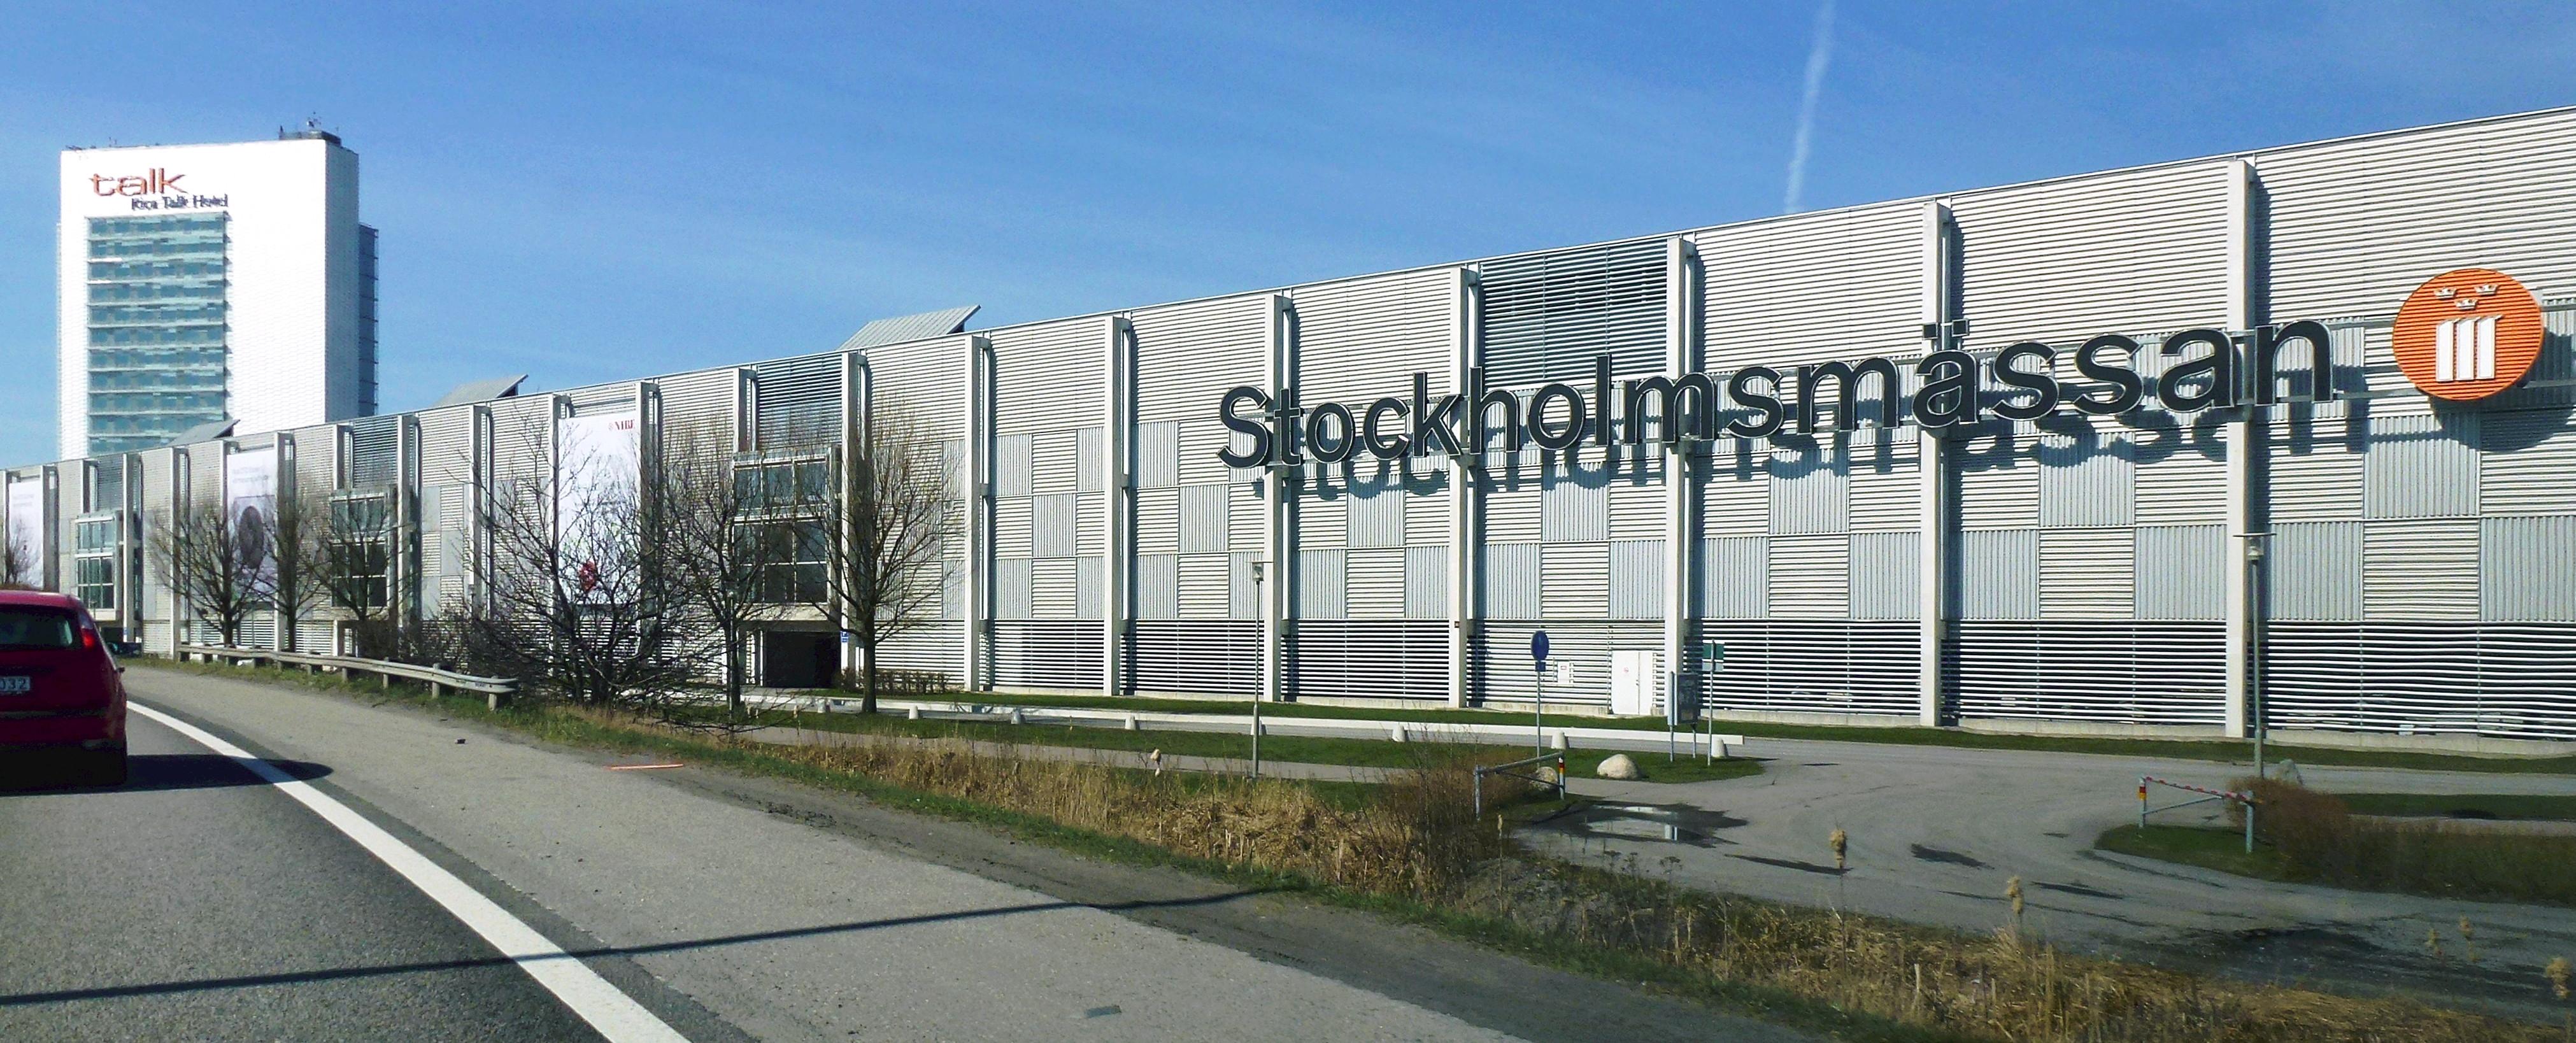 hotel stockholm scandic klara